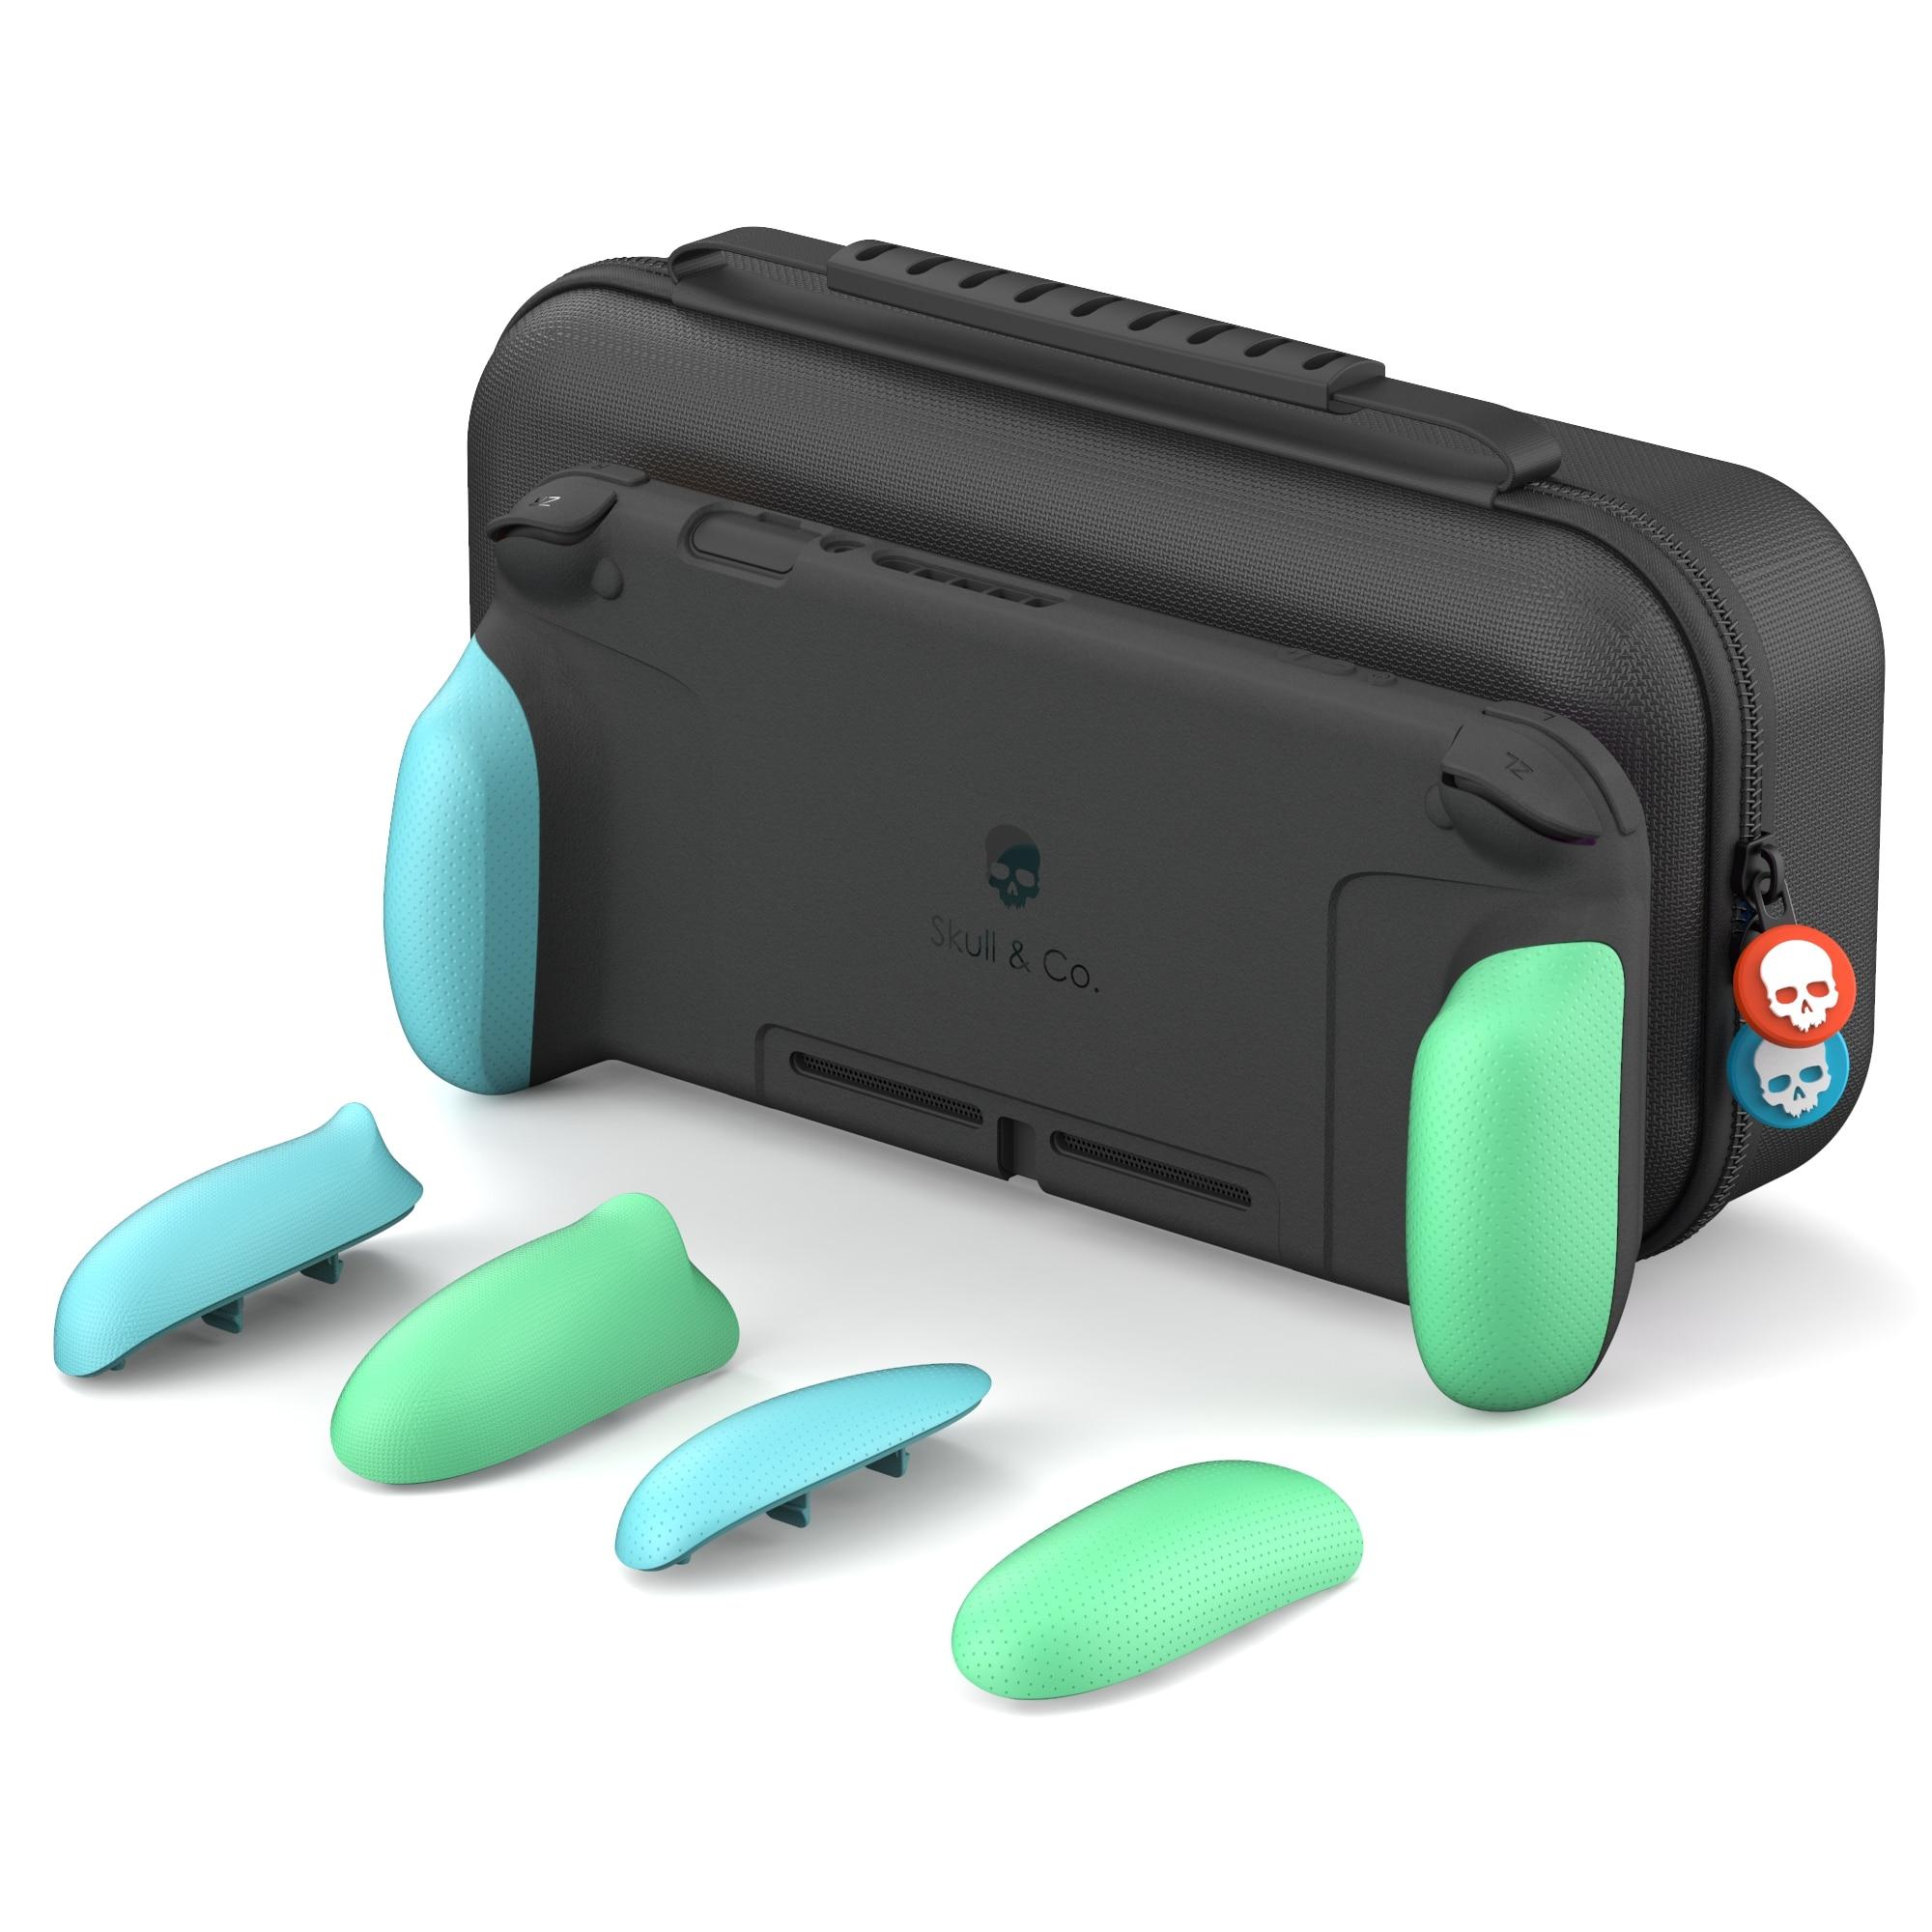 Funda protectora Skull & Co. Animal Crossing GripCase con empuñaduras reemplazables MaxCarry para Nintendo Switch